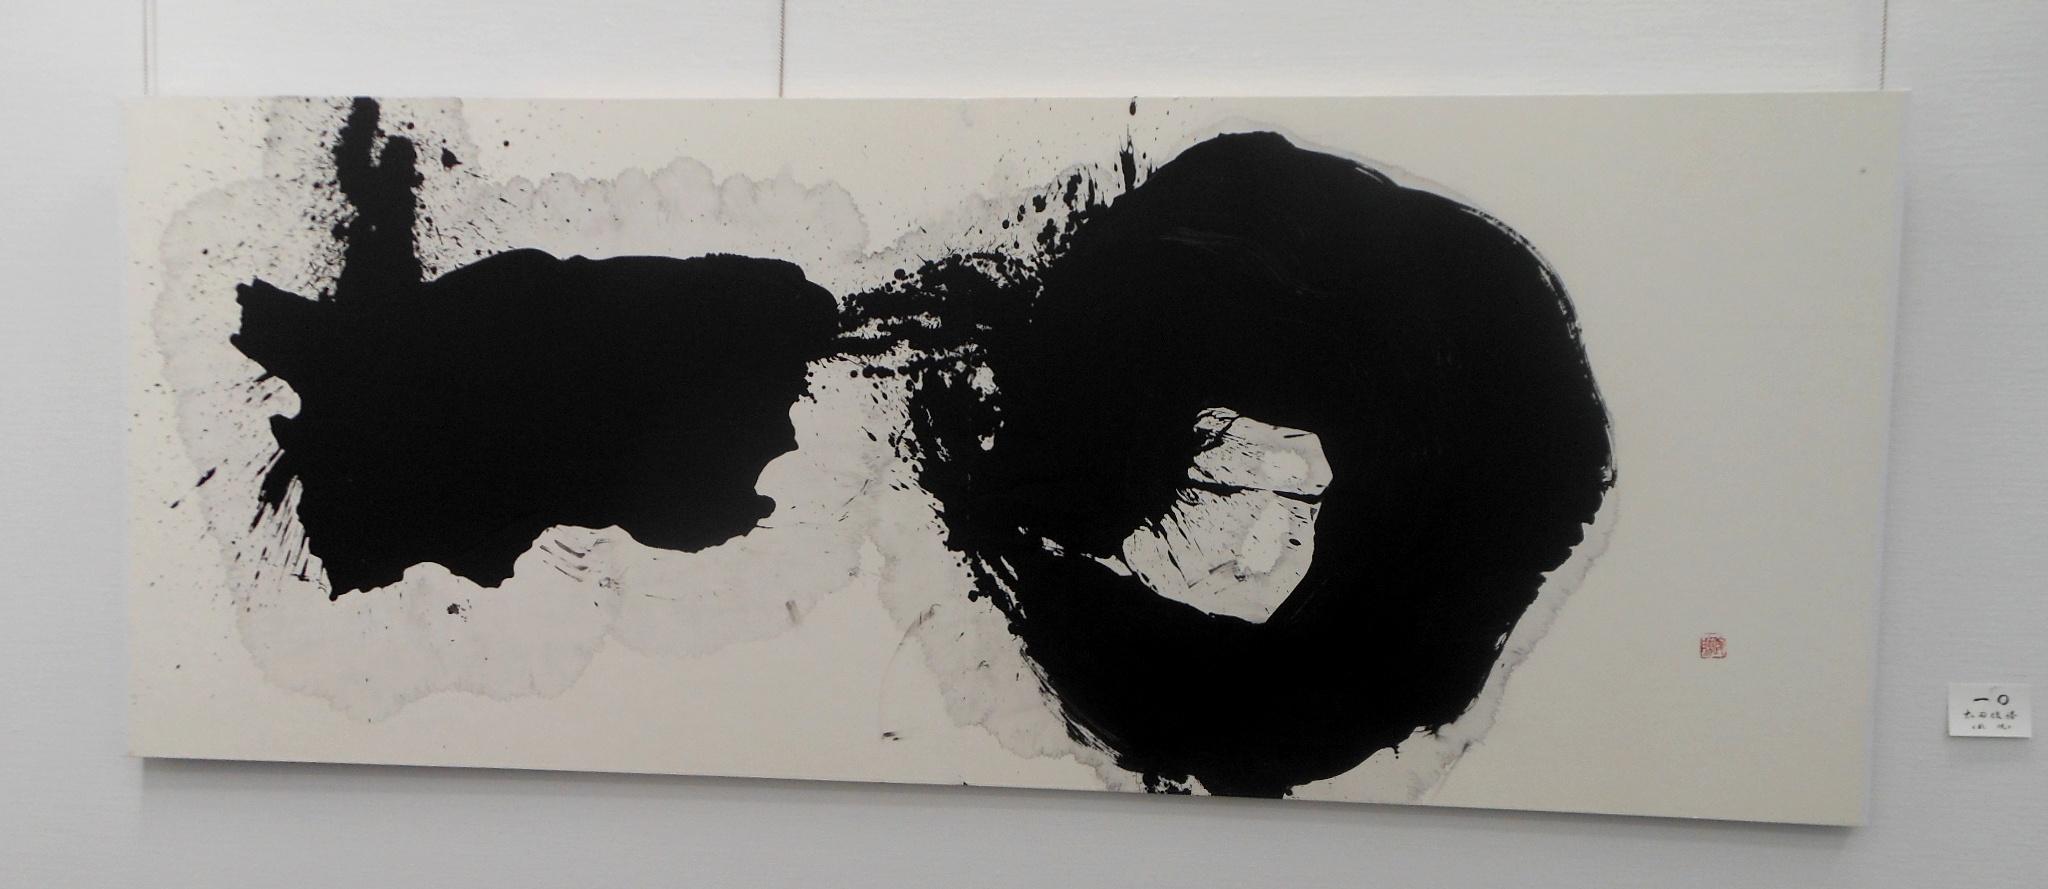 1690)「第26回 北海道墨人展」 市民ギャラリー 4月4日(水)~4月8日(日) _f0126829_1652589.jpg